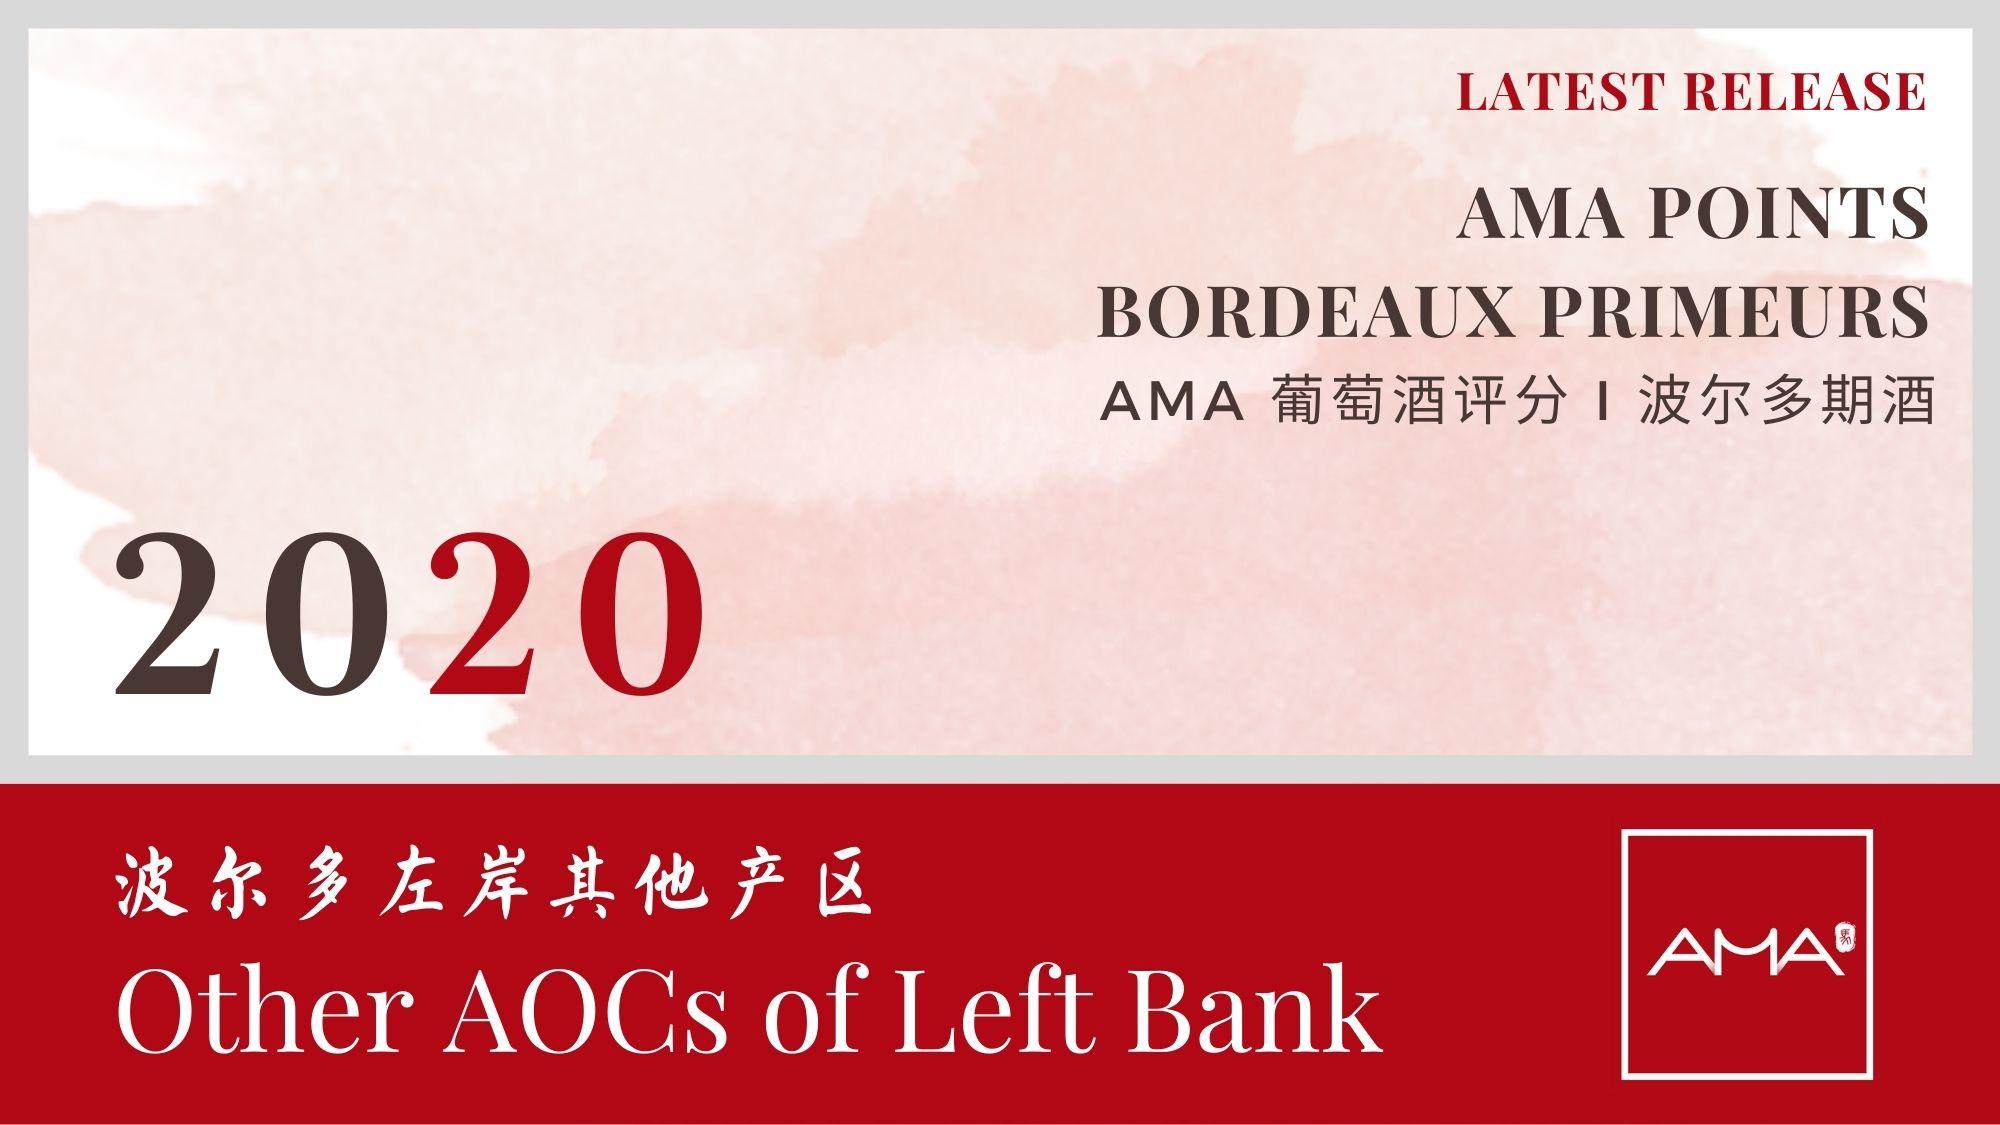 LATEST RELEASE – Bordeaux 2020 Tasting Report En Primeurs – Other left banks' AOC - Alexandre MA